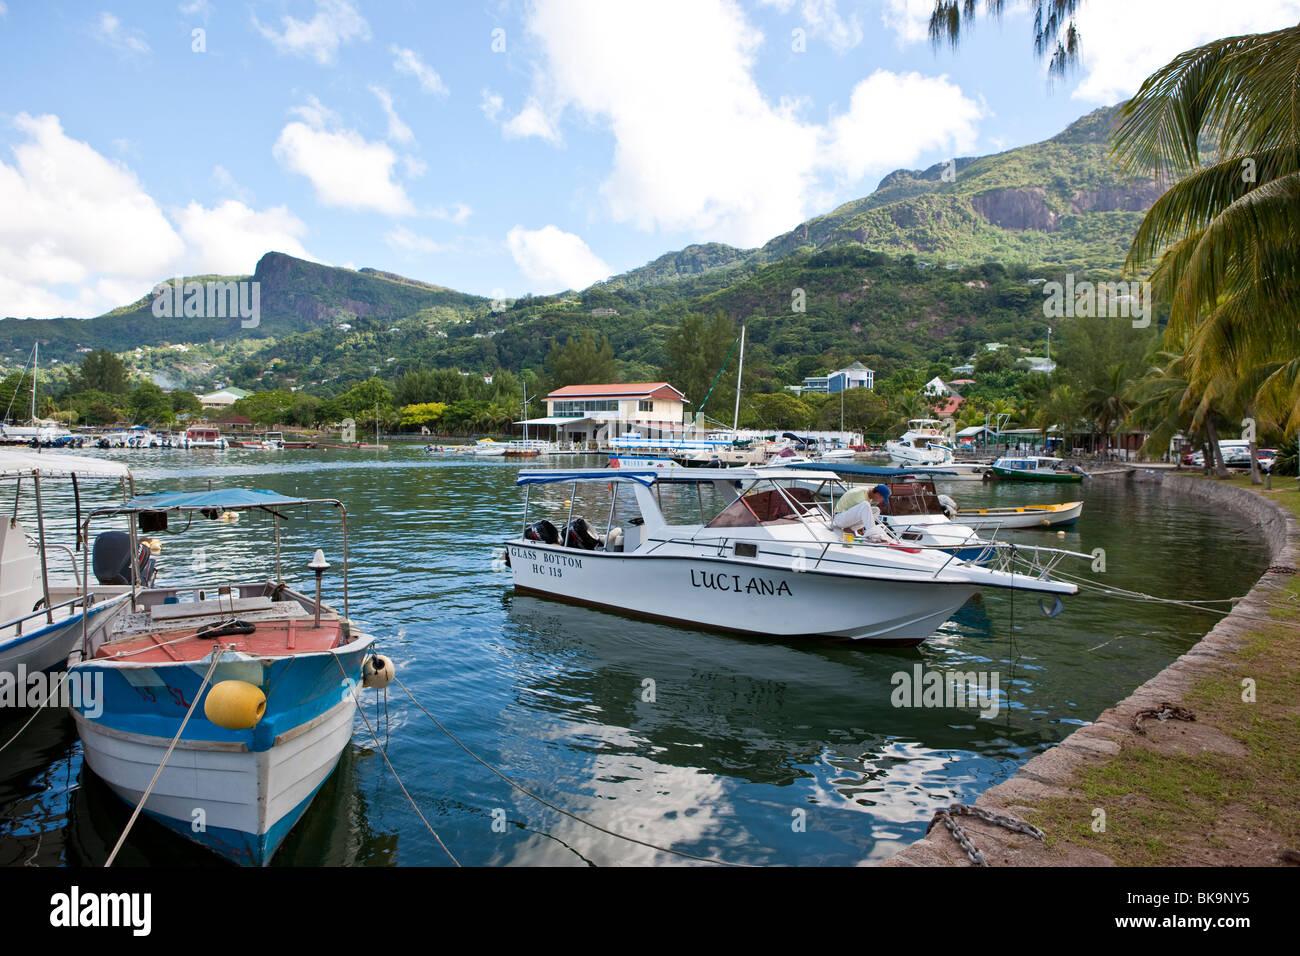 Yacht Club, Seychelles Marine Charter Association on 5th June Avenue, the capital city of Victoria, Mahe Island, - Stock Image